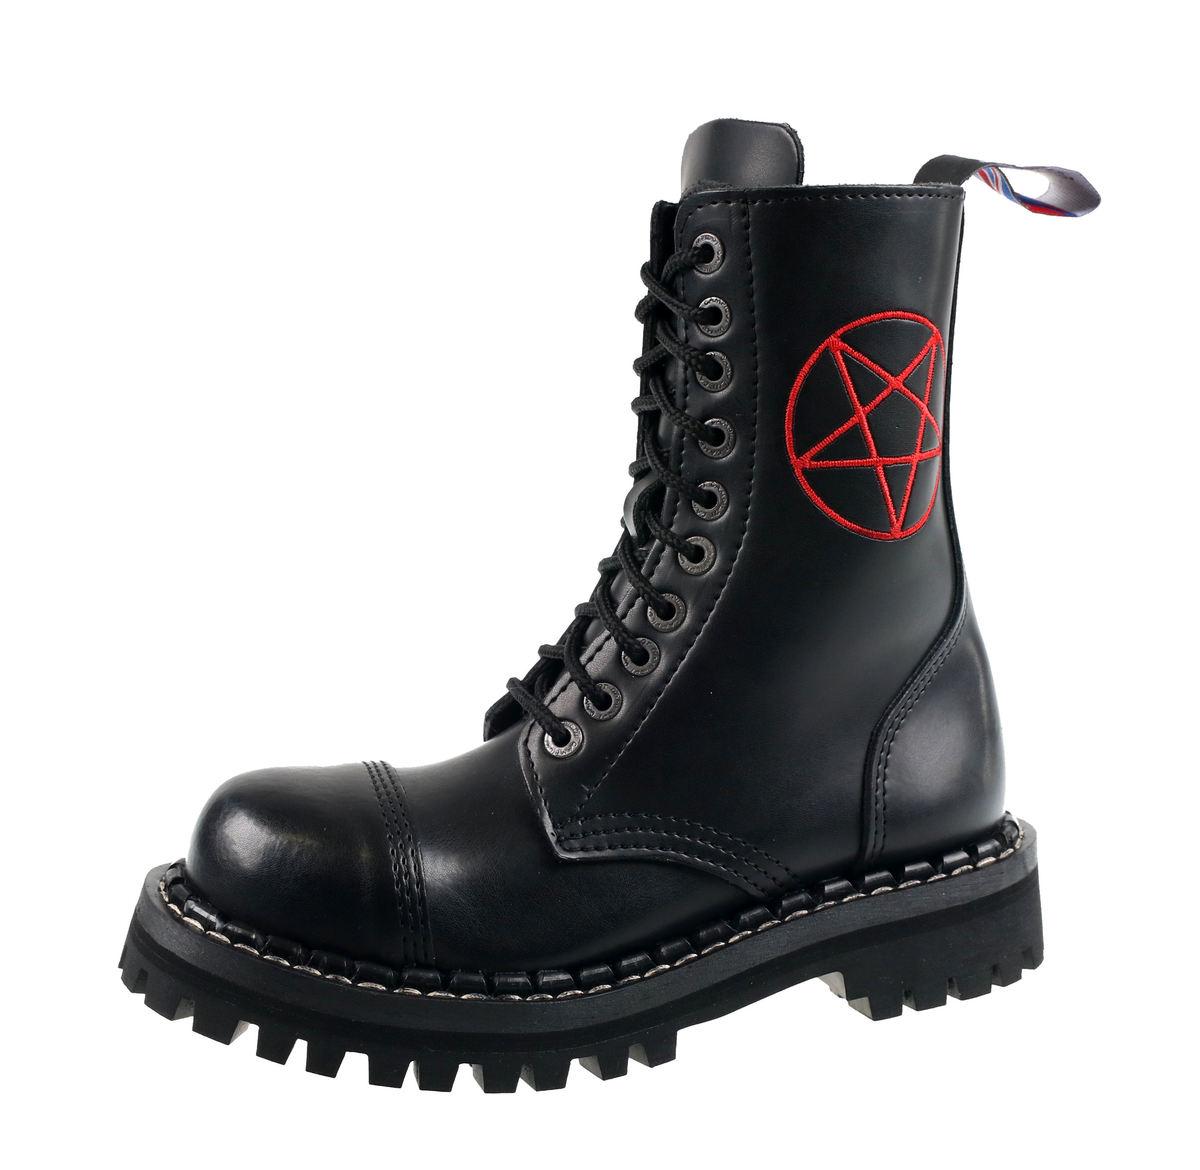 31a3593485ea topánky STEADY´S - 10 dierkové - Pentagram red - STE 10 H pentagram ...